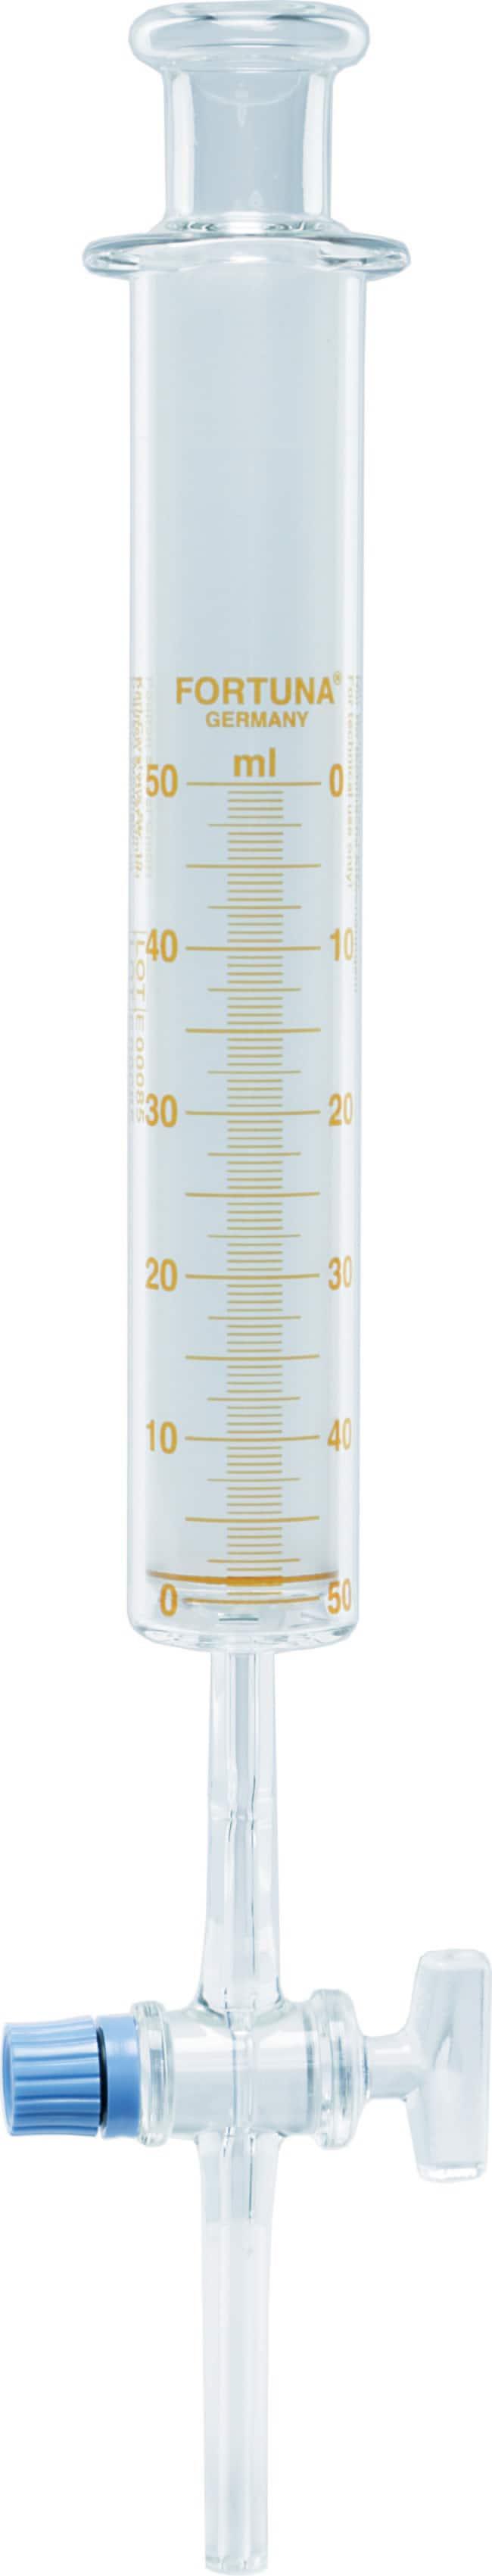 Poulten & Graf GmbHFORTUNA™ Precision Gas Syringe Volume Metric: 50mL Poulten & Graf GmbHFORTUNA™ Precision Gas Syringe